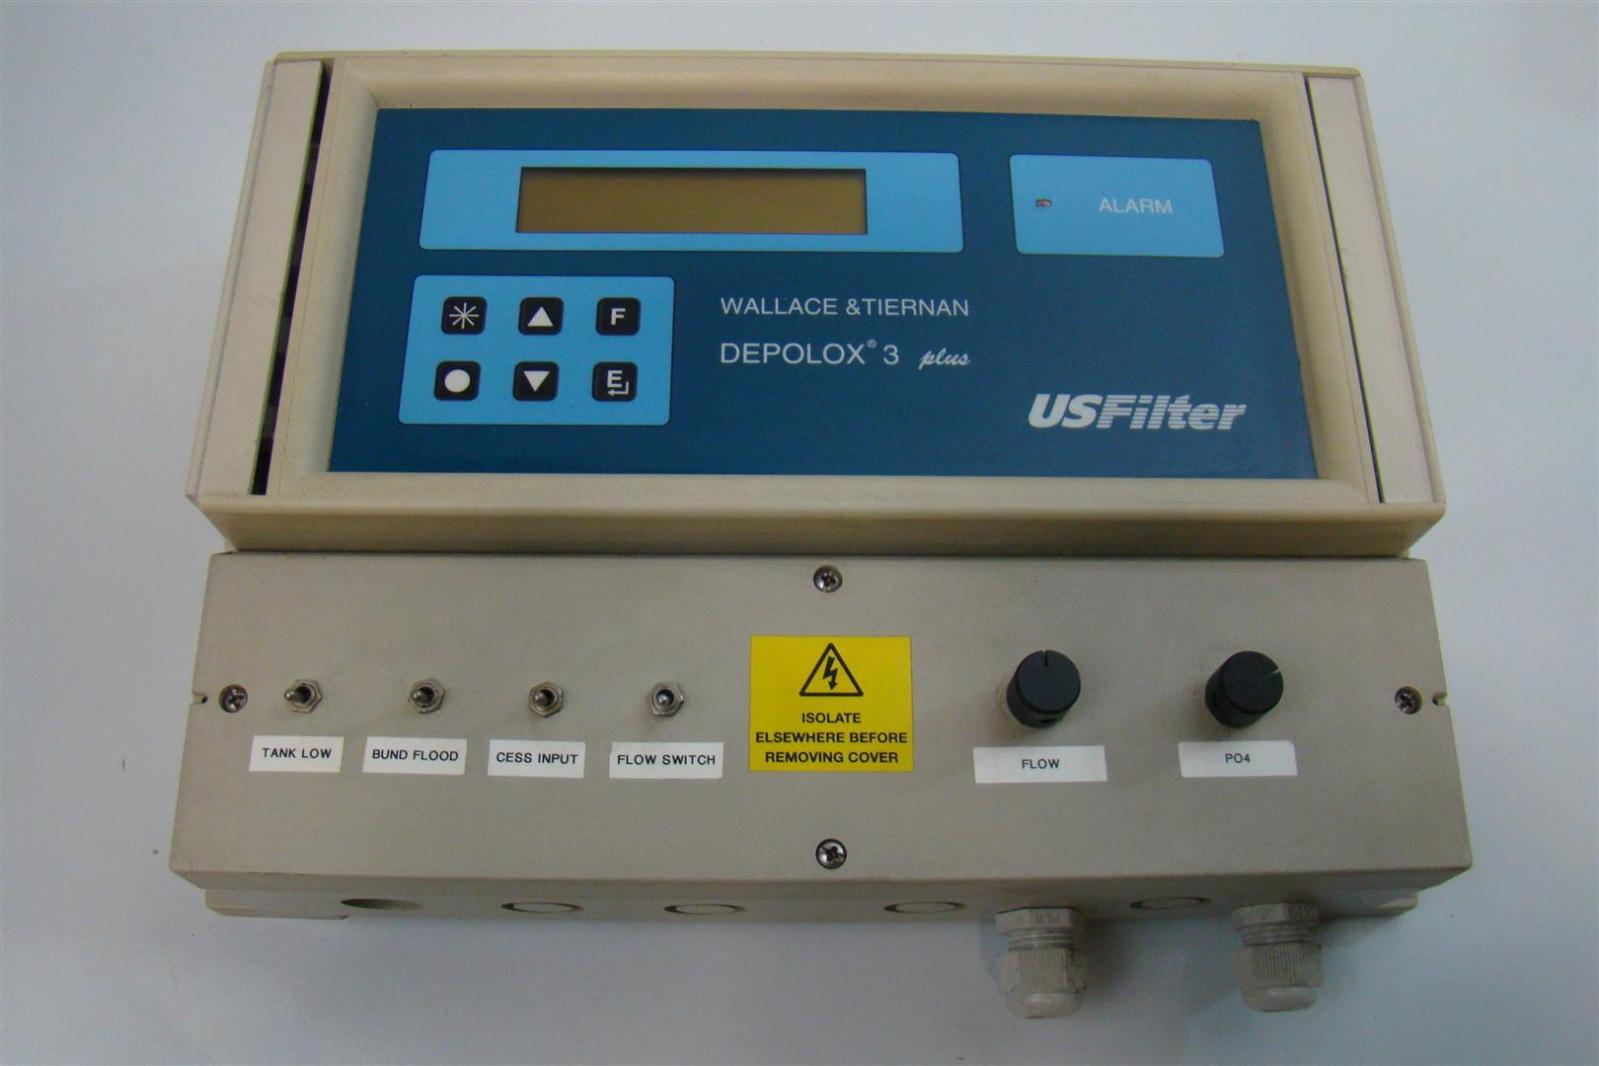 Wallace & Tiernan Products Deplox 3 PLus Residual Analyzer 50/60Hz 155Vac  0,315A